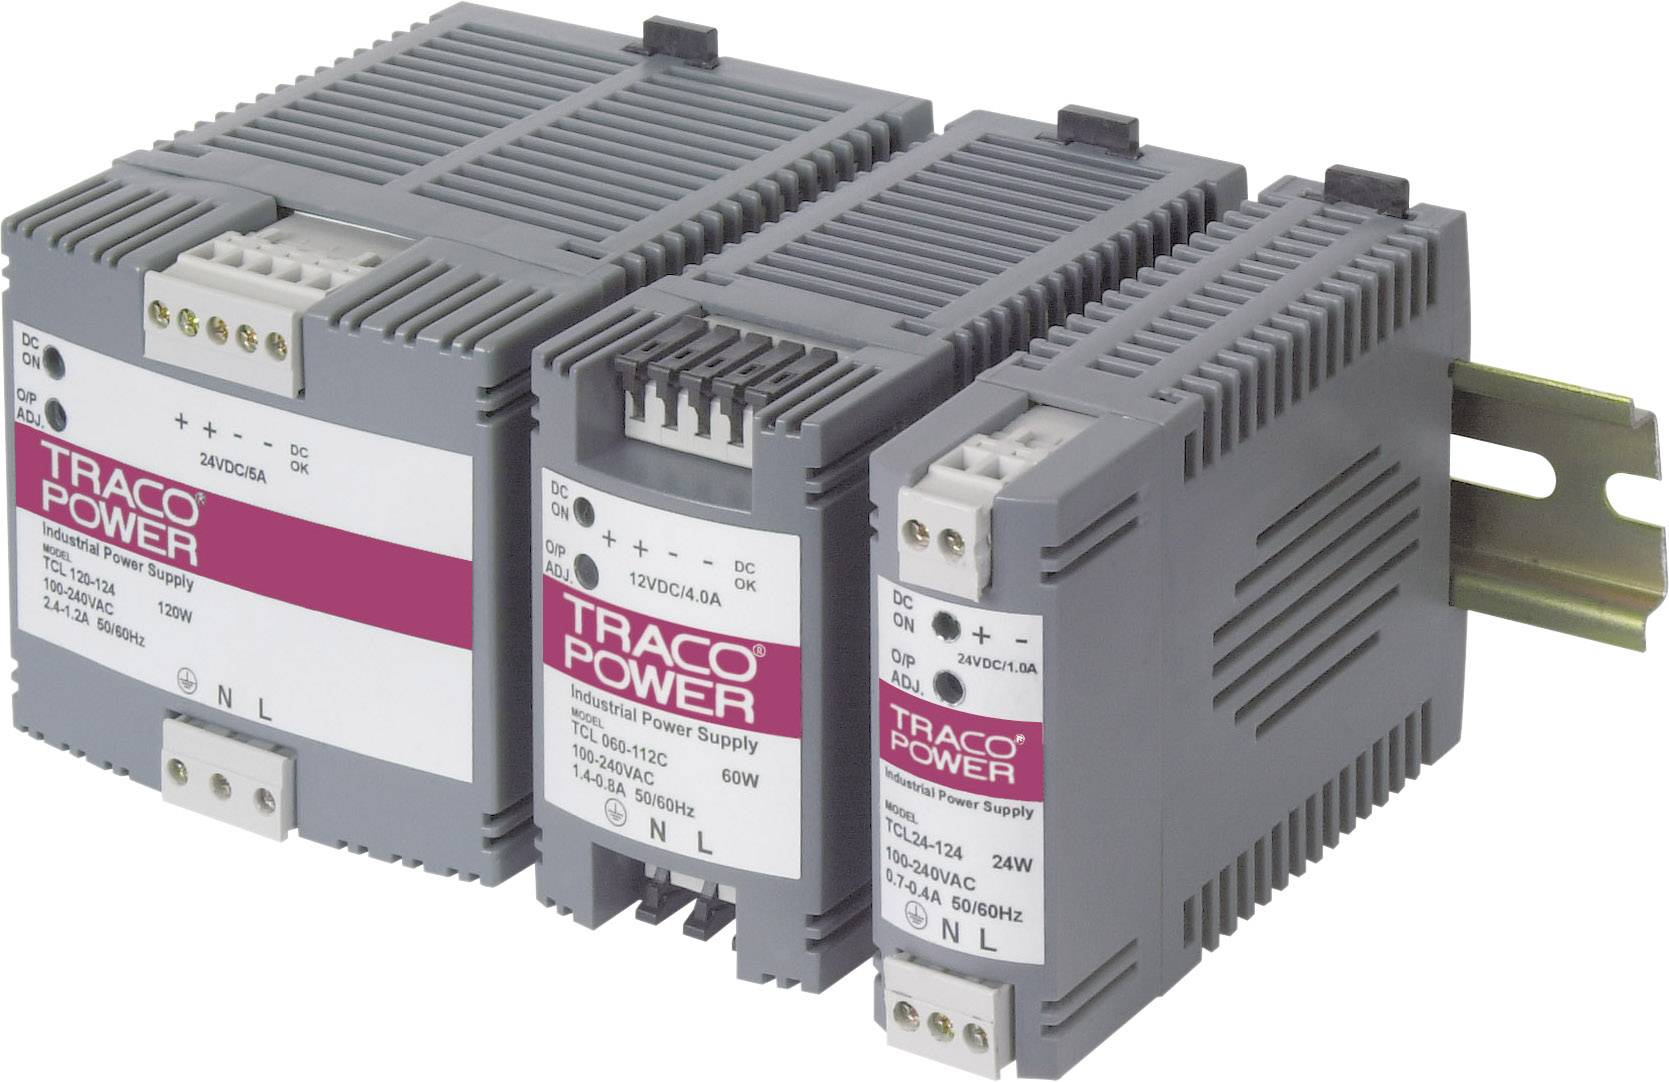 Zdroj na DIN lištu TracoPower TCL 120-124C, 24 V/DC, 5 A